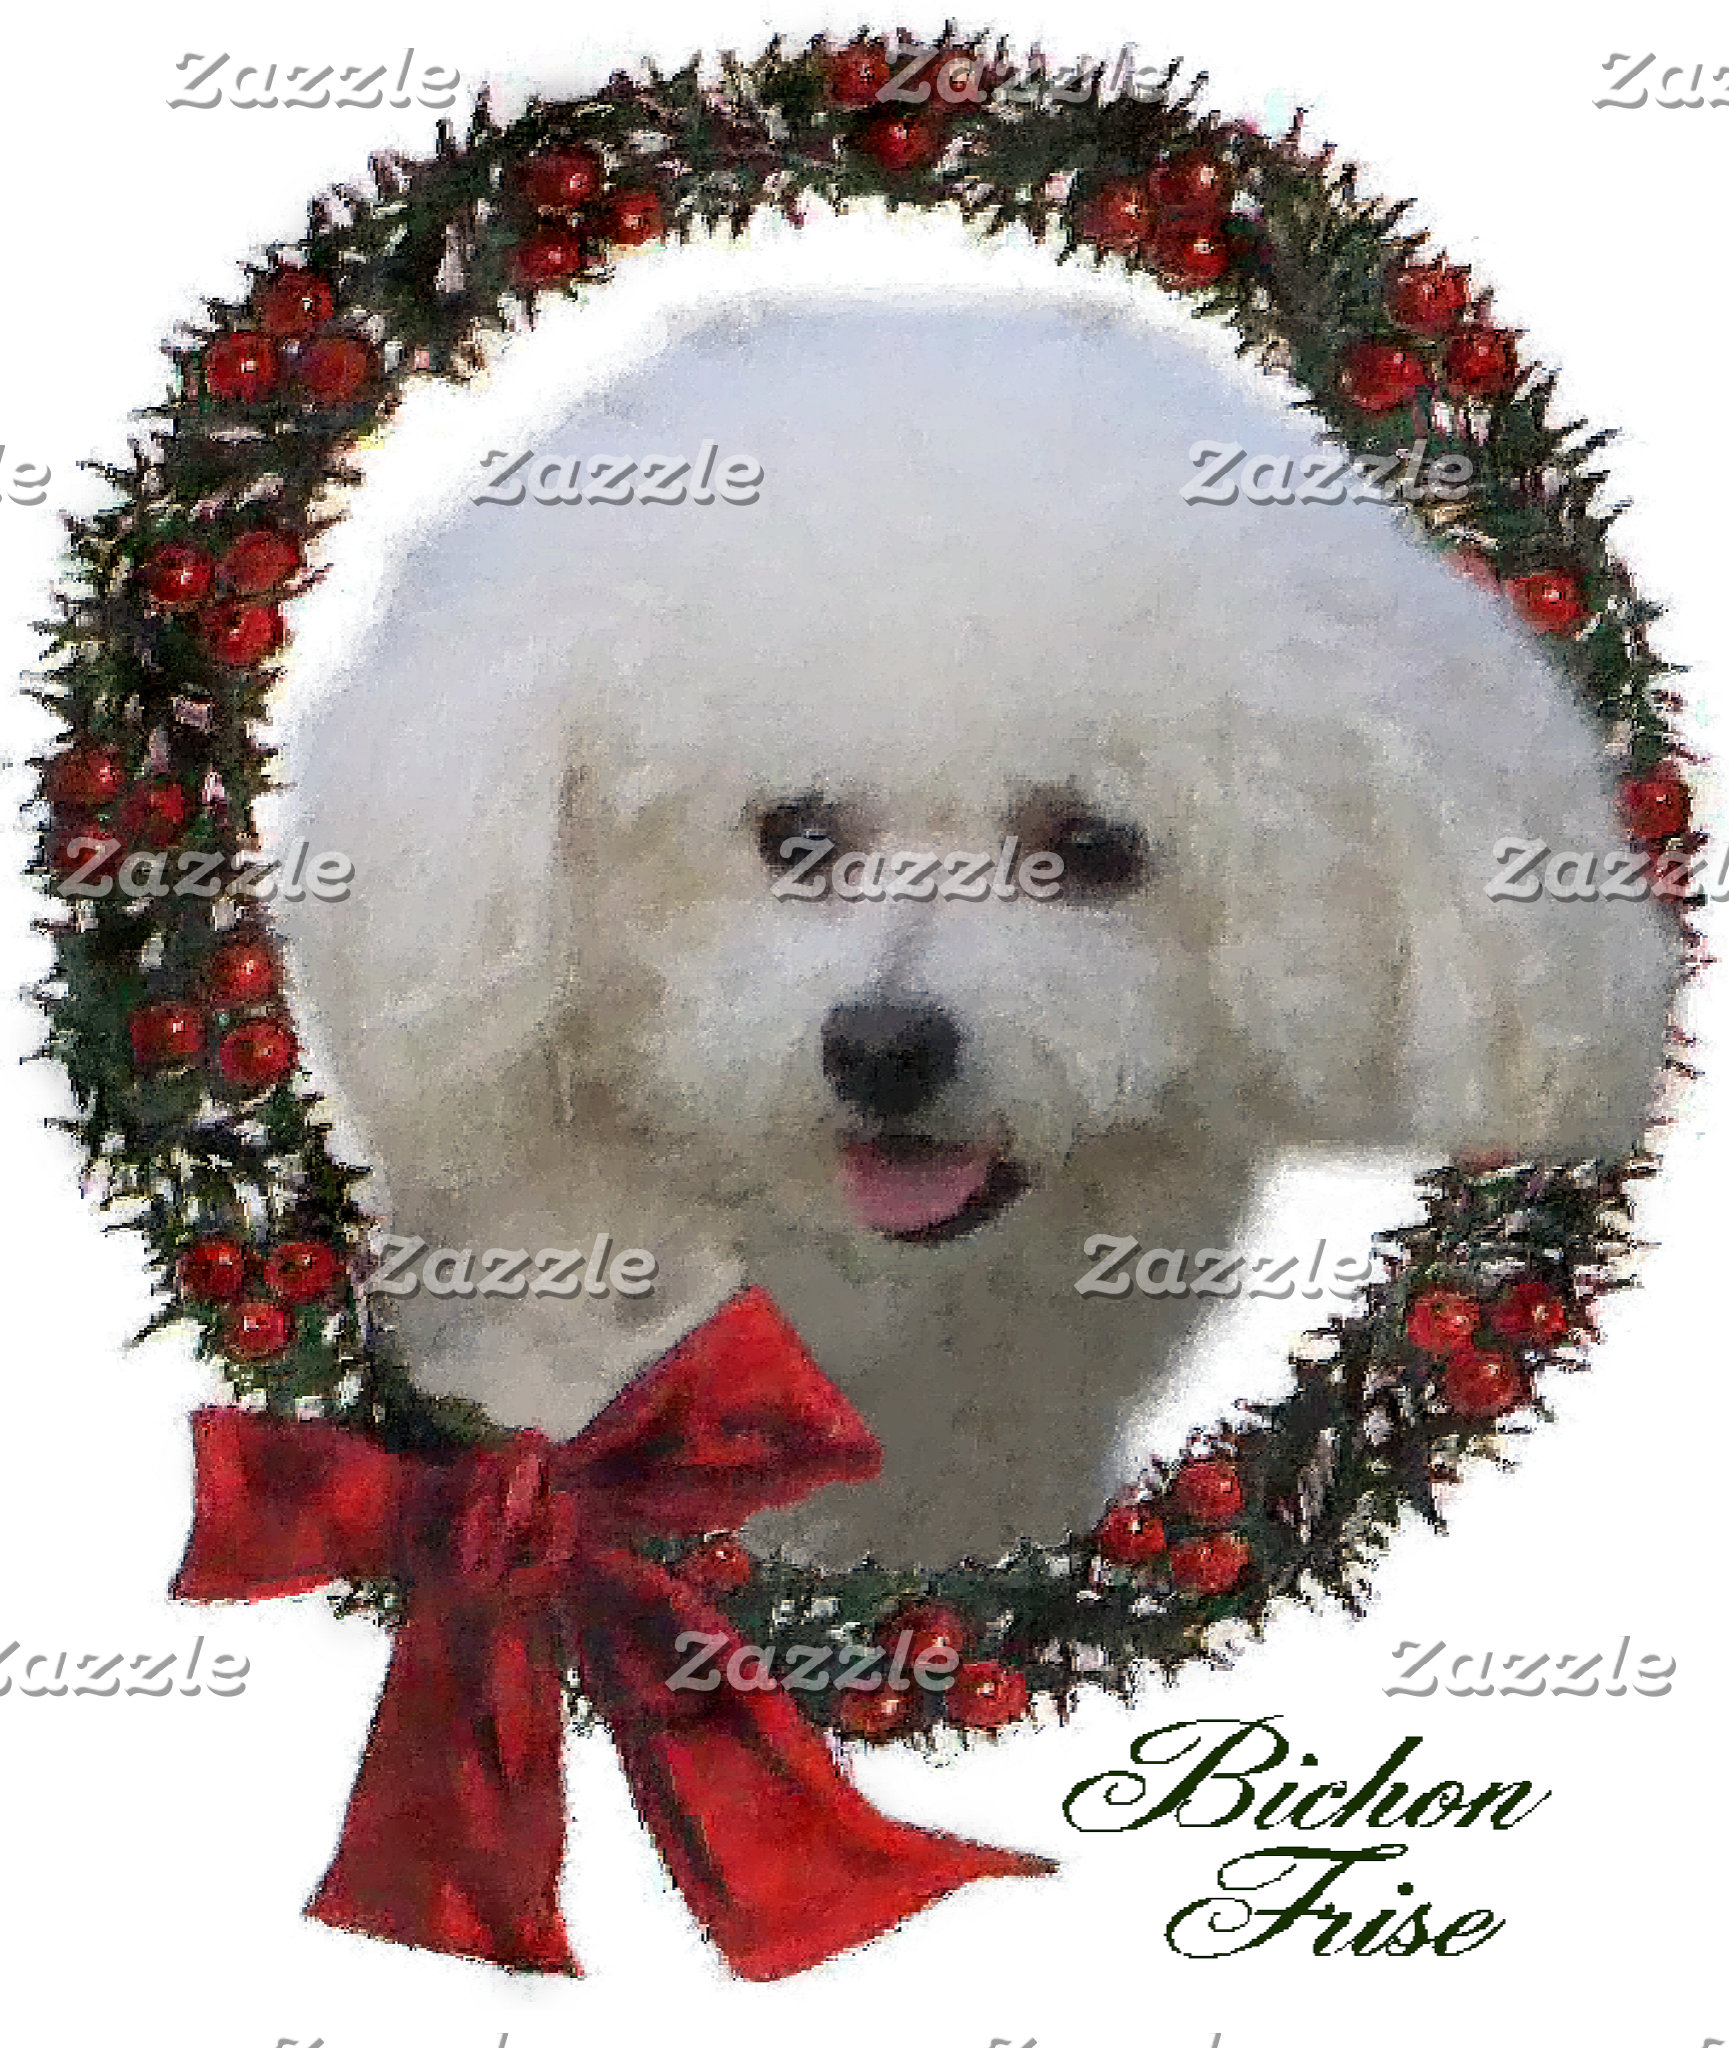 Bichon Frise Christmas